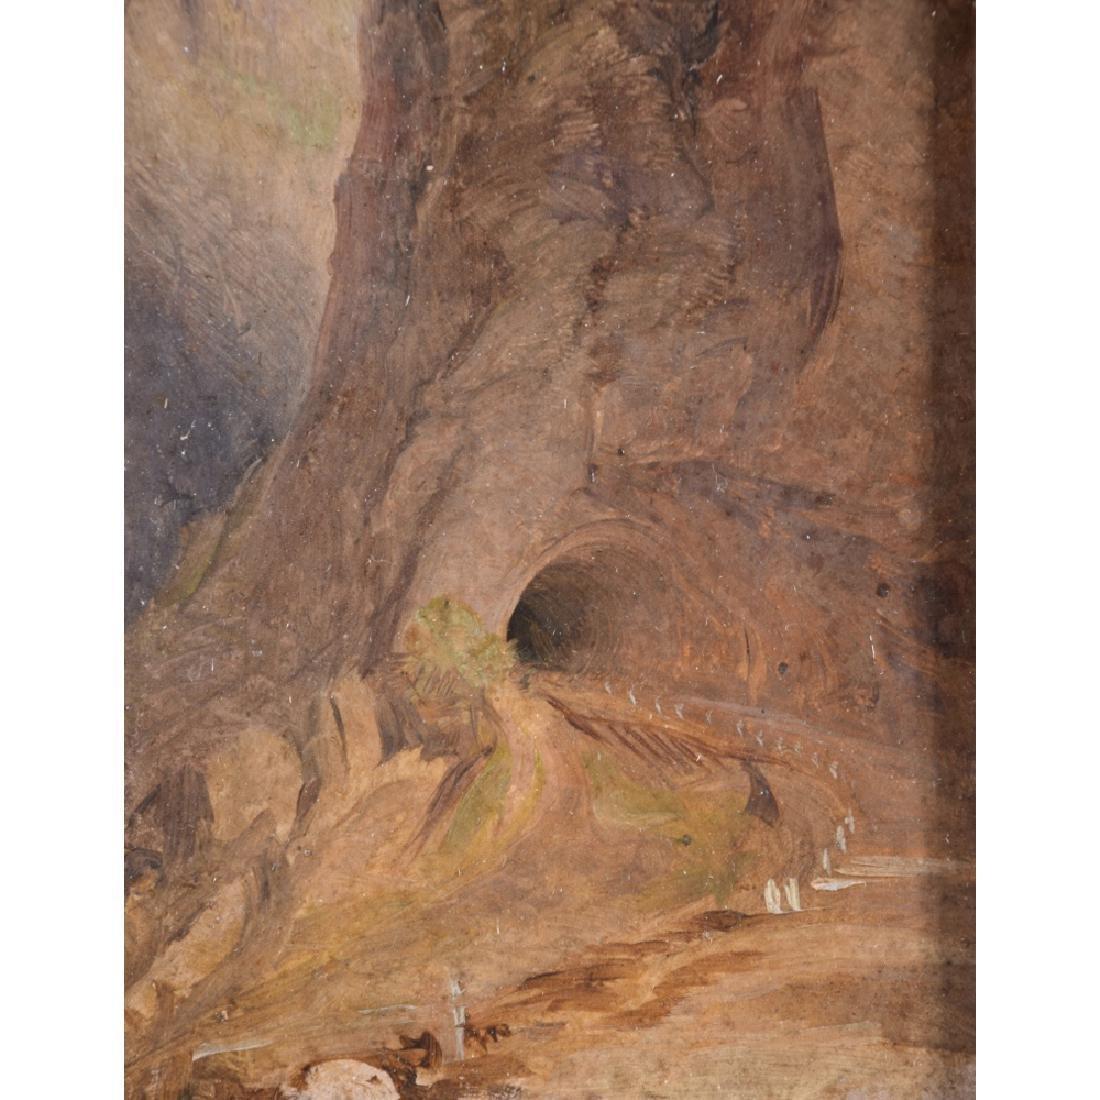 Joseph M W TURNER (1775-1851) - Tunnel - 2